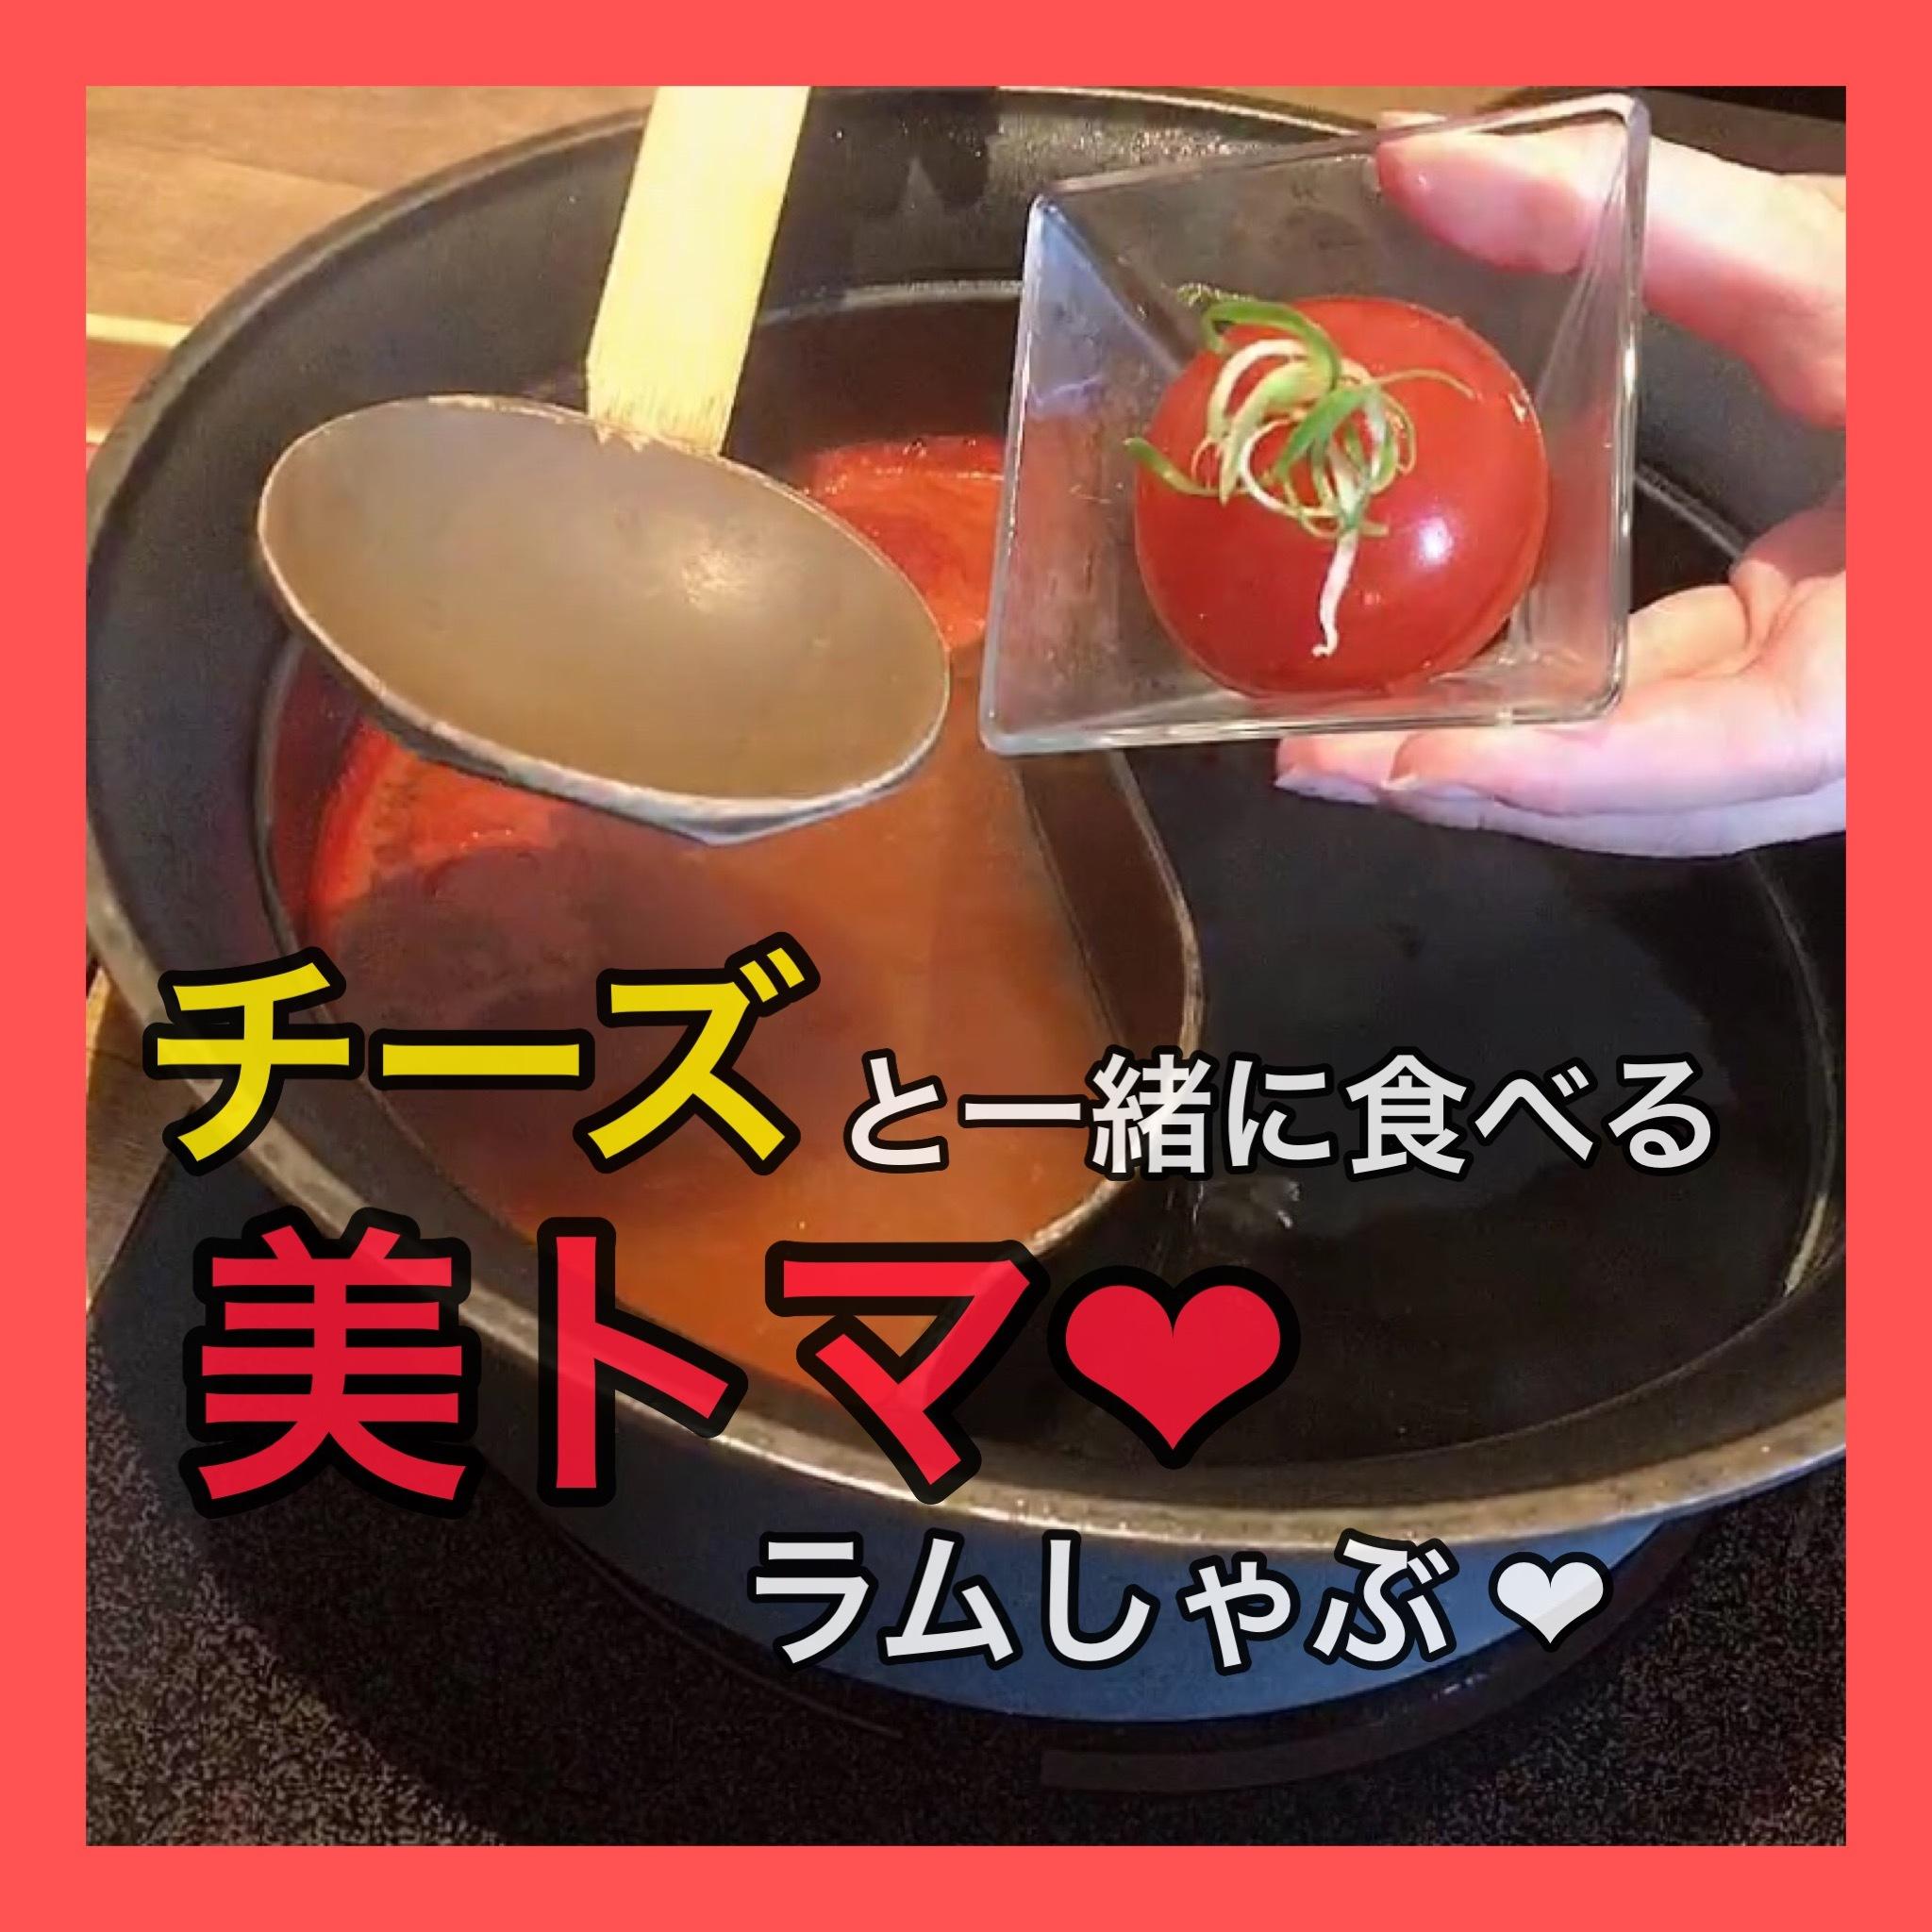 4687e2980dce 「食べ放題」に関する記事 | HAPPY PLUS ONE(ハピプラワン)